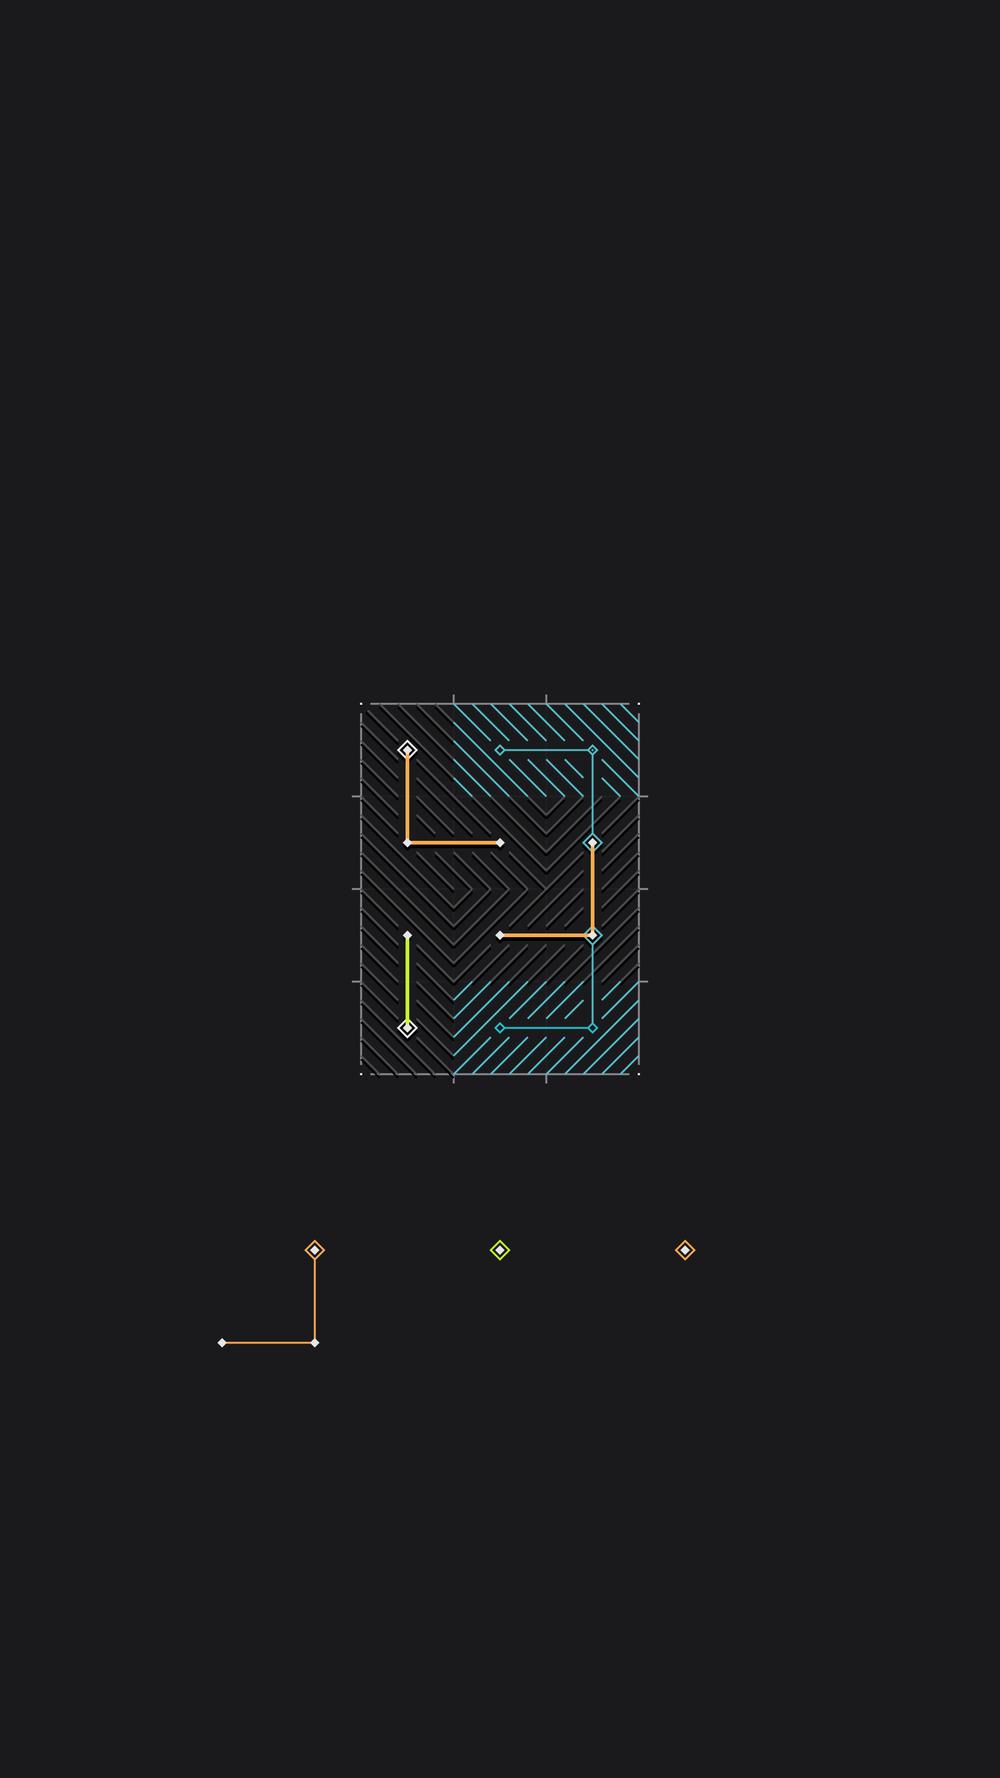 puzzle-depth-22.png